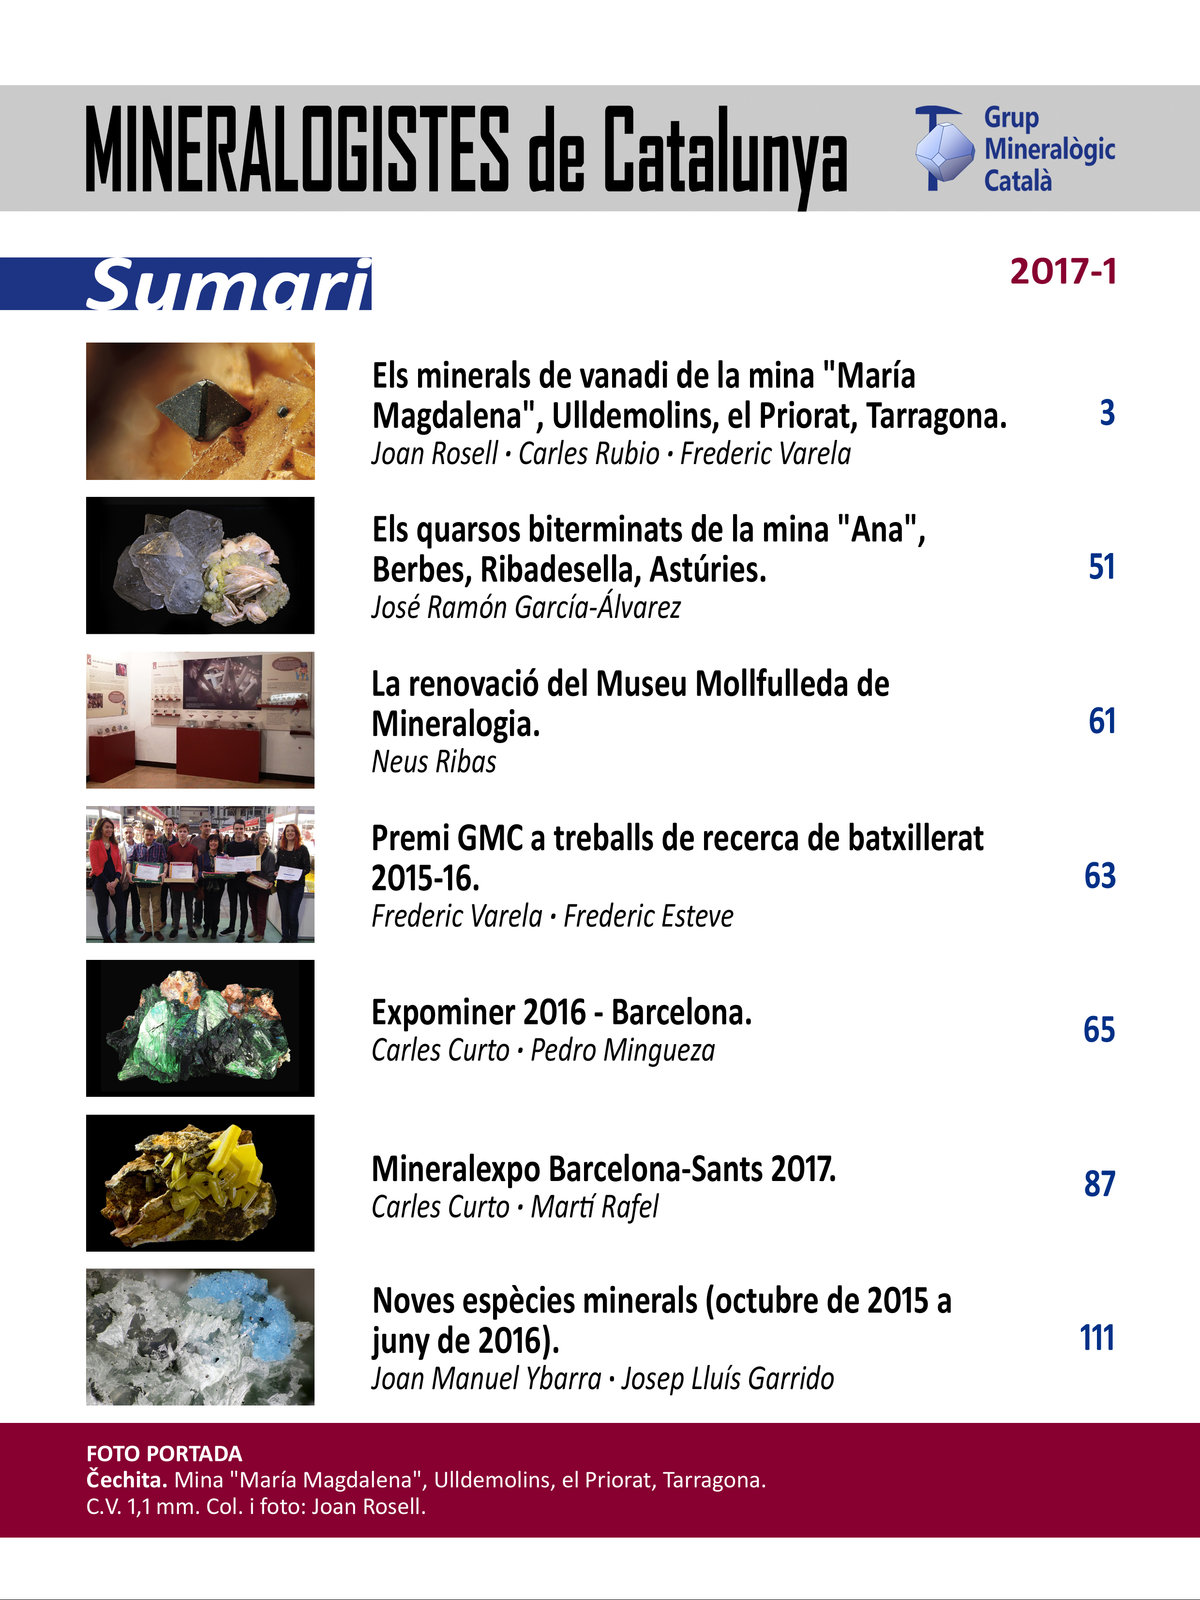 <em>Mineralogistes</em> (2017-1) - Sumari